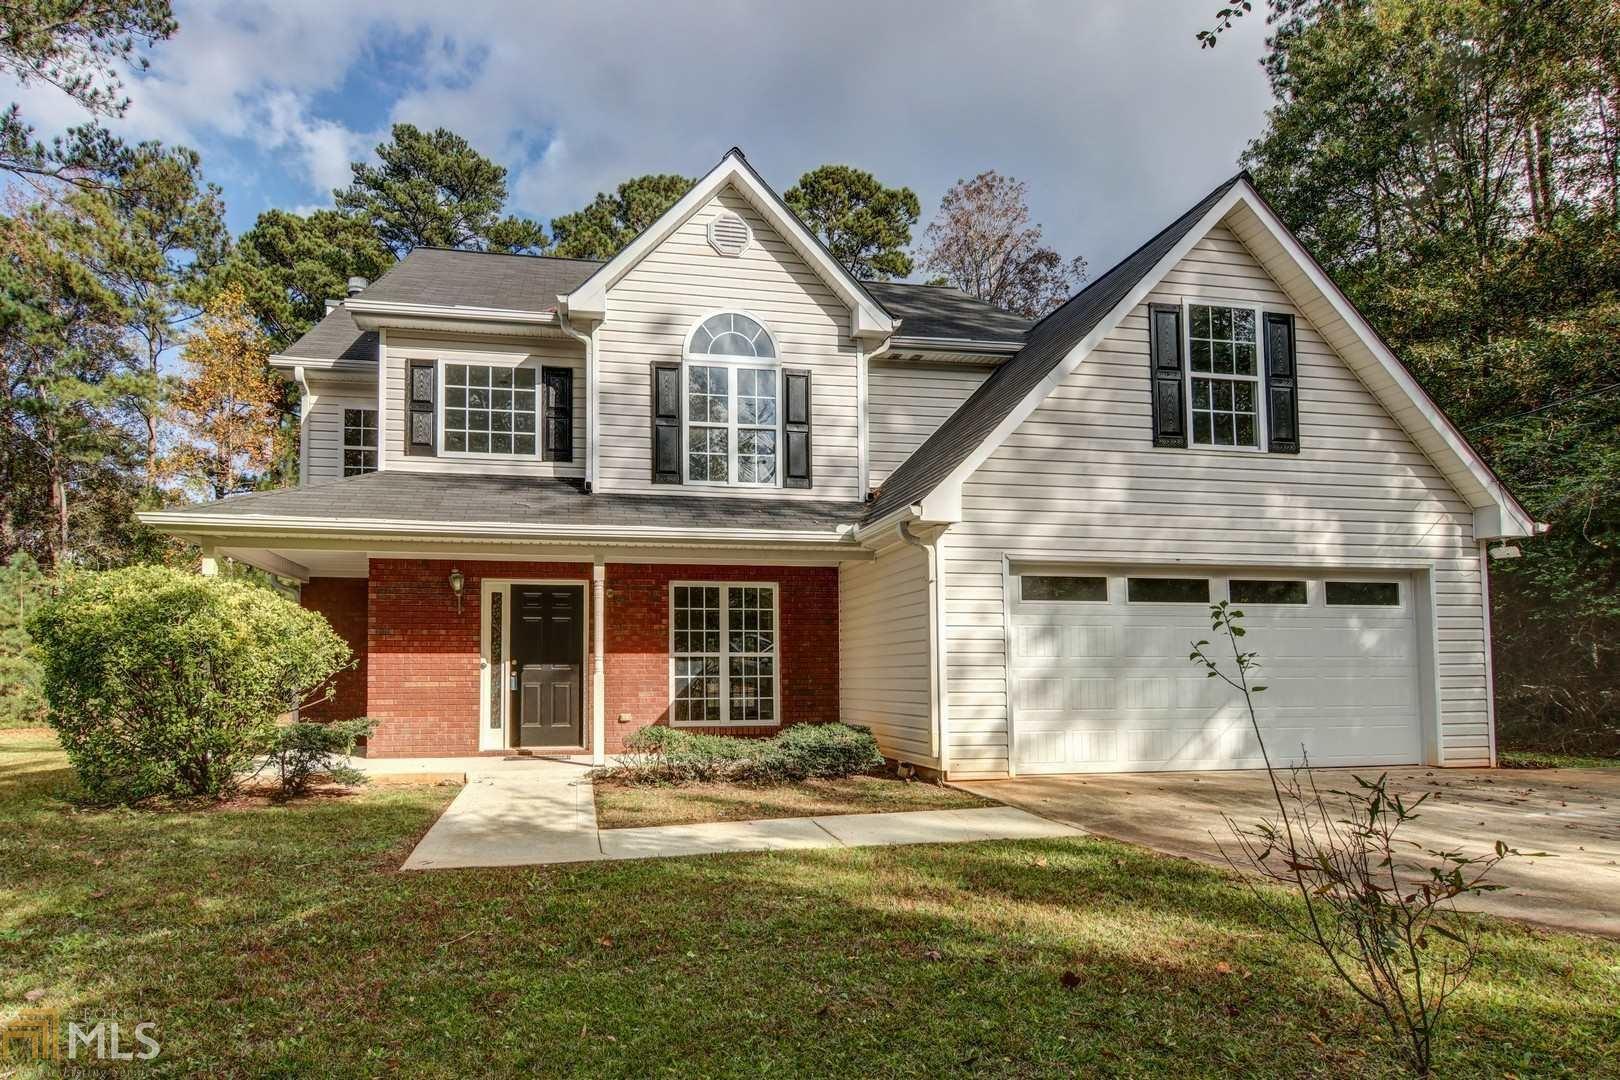 2822 Arbor Ct, Conyers, GA 30013 - MLS#: 8888850